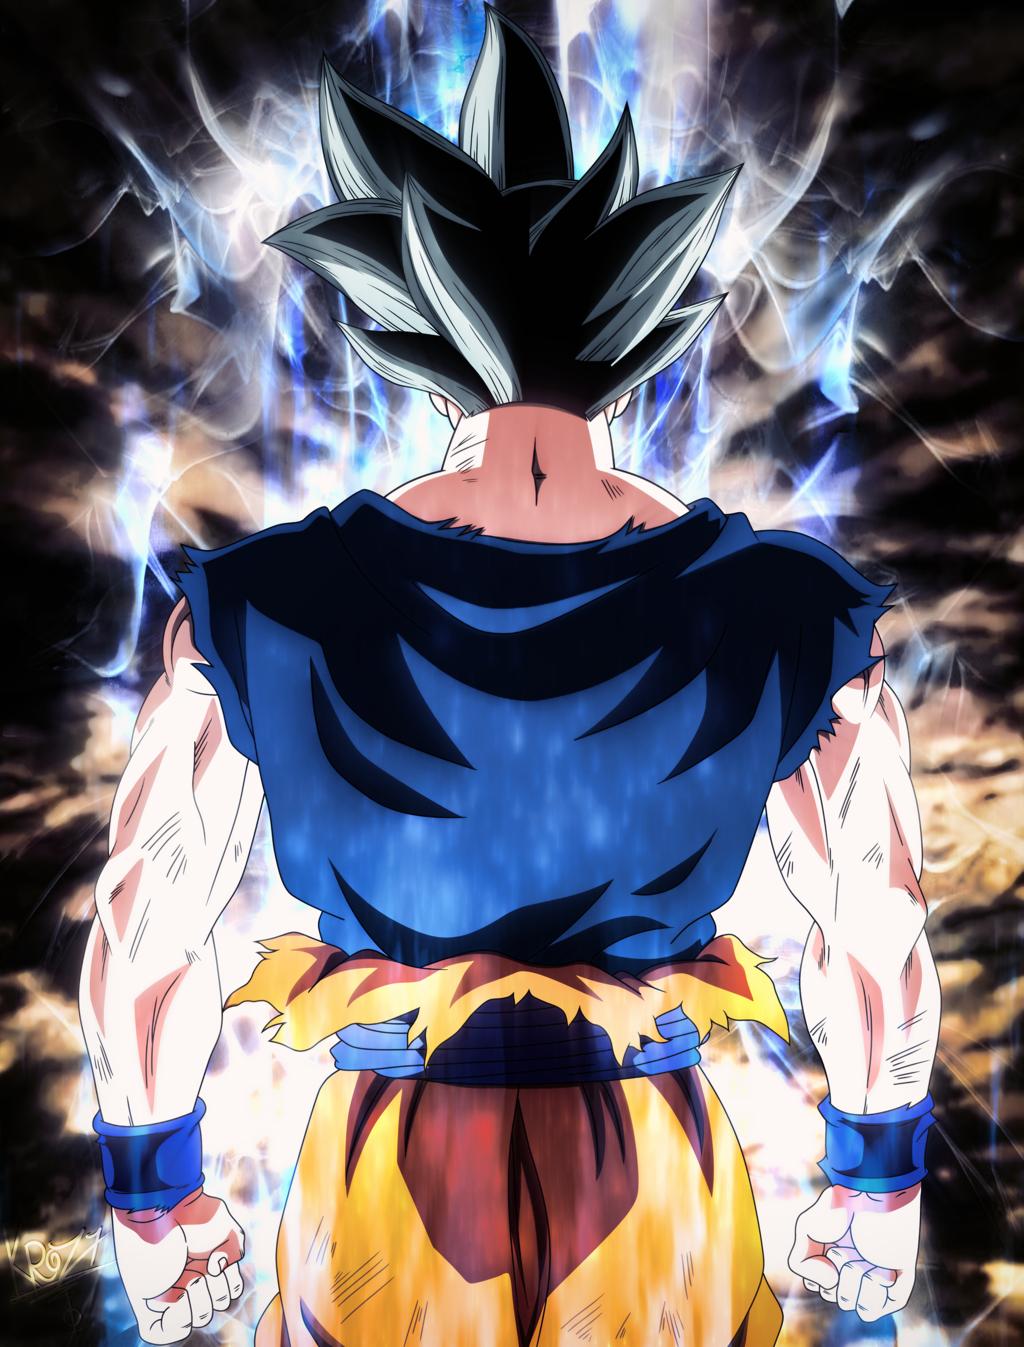 Goku ultra instinct mastered wallpapers wallpapersafari - Goku ultra instinct mastered wallpaper ...